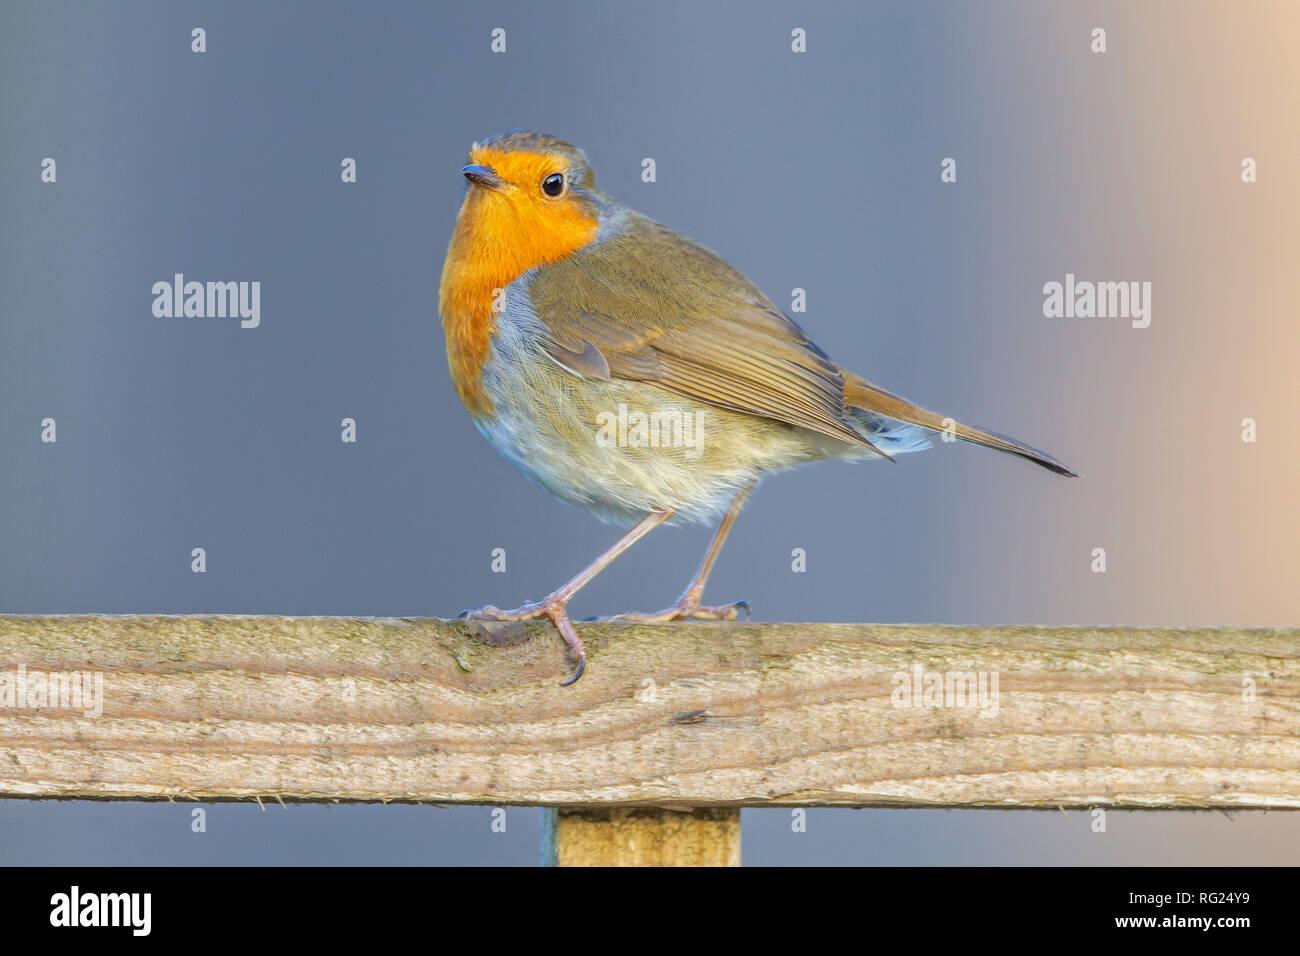 Northampton, UK. 27th January 2019. RSPB's Big Garden Birdwatch marks 40 years. Credit: Keith J Smith./Alamy Live News - Stock Image